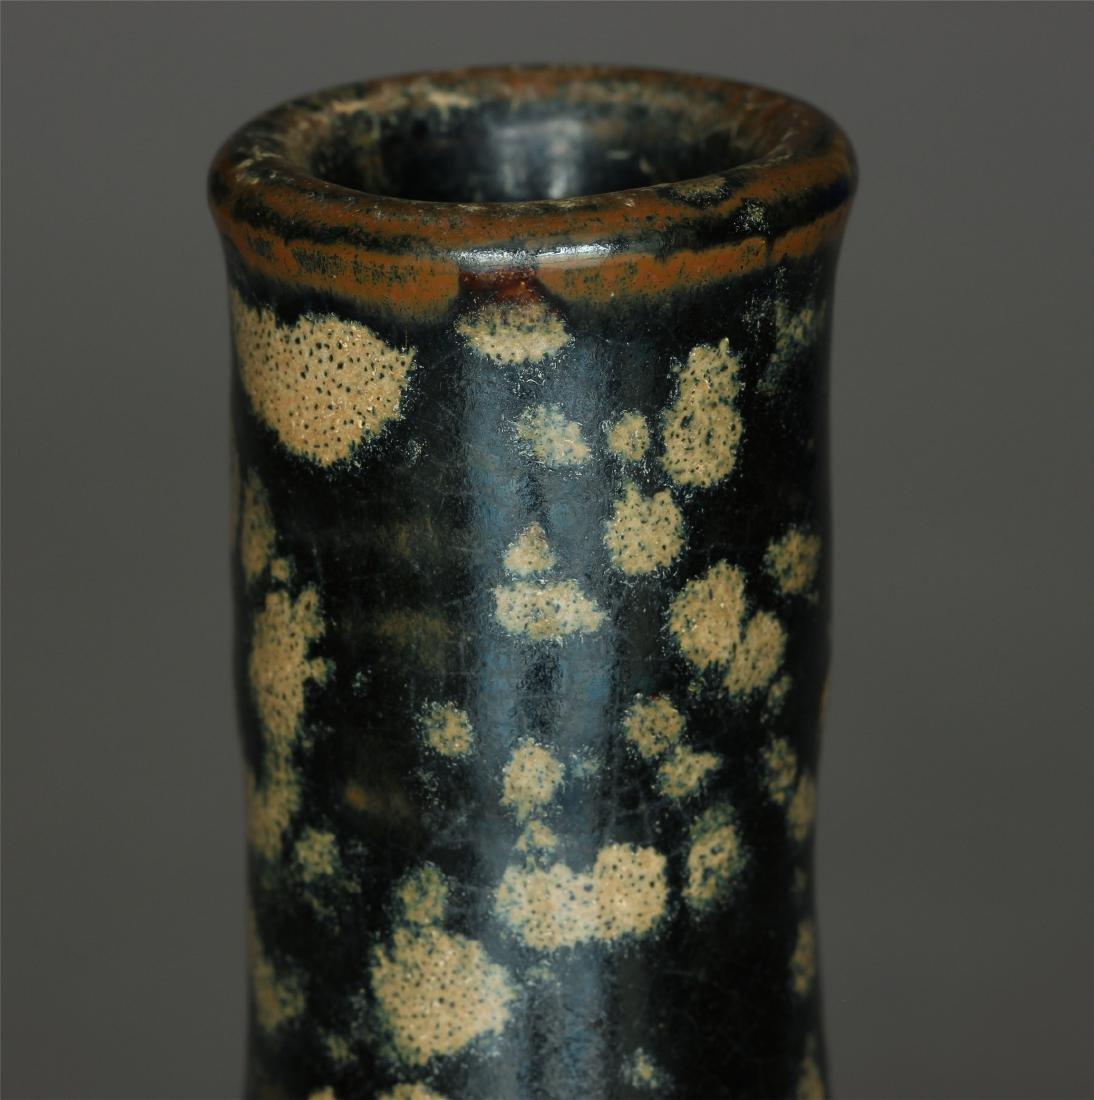 A JiZhou-Kiln Small Vase. Measure(inch), Height: 4-3/4 - 5